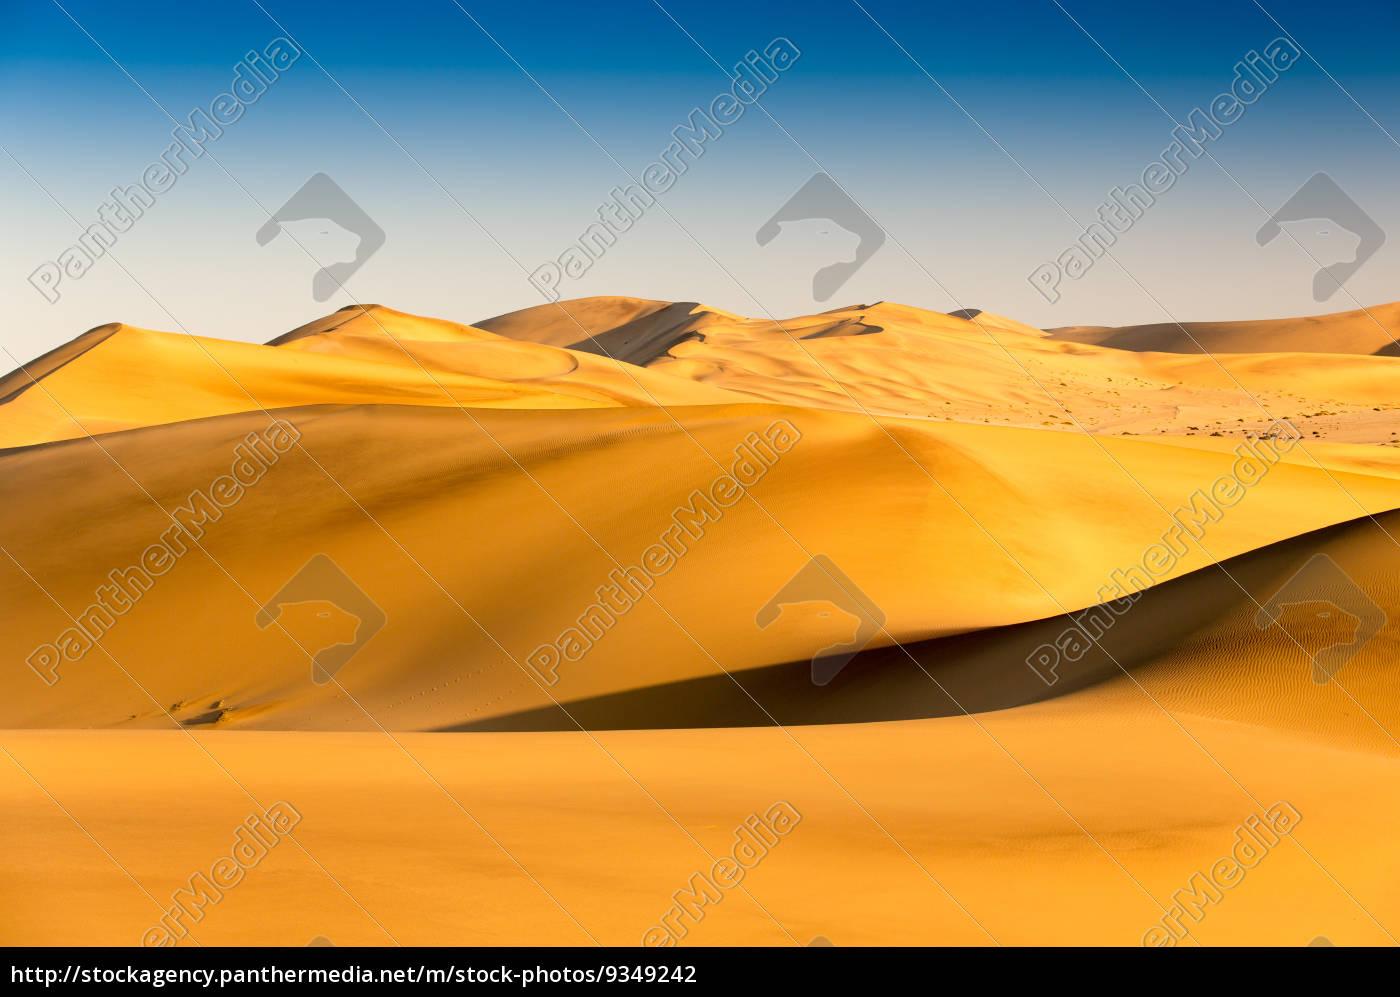 desierto, áfrica, namibia, seco, duna, arenas - 9349242